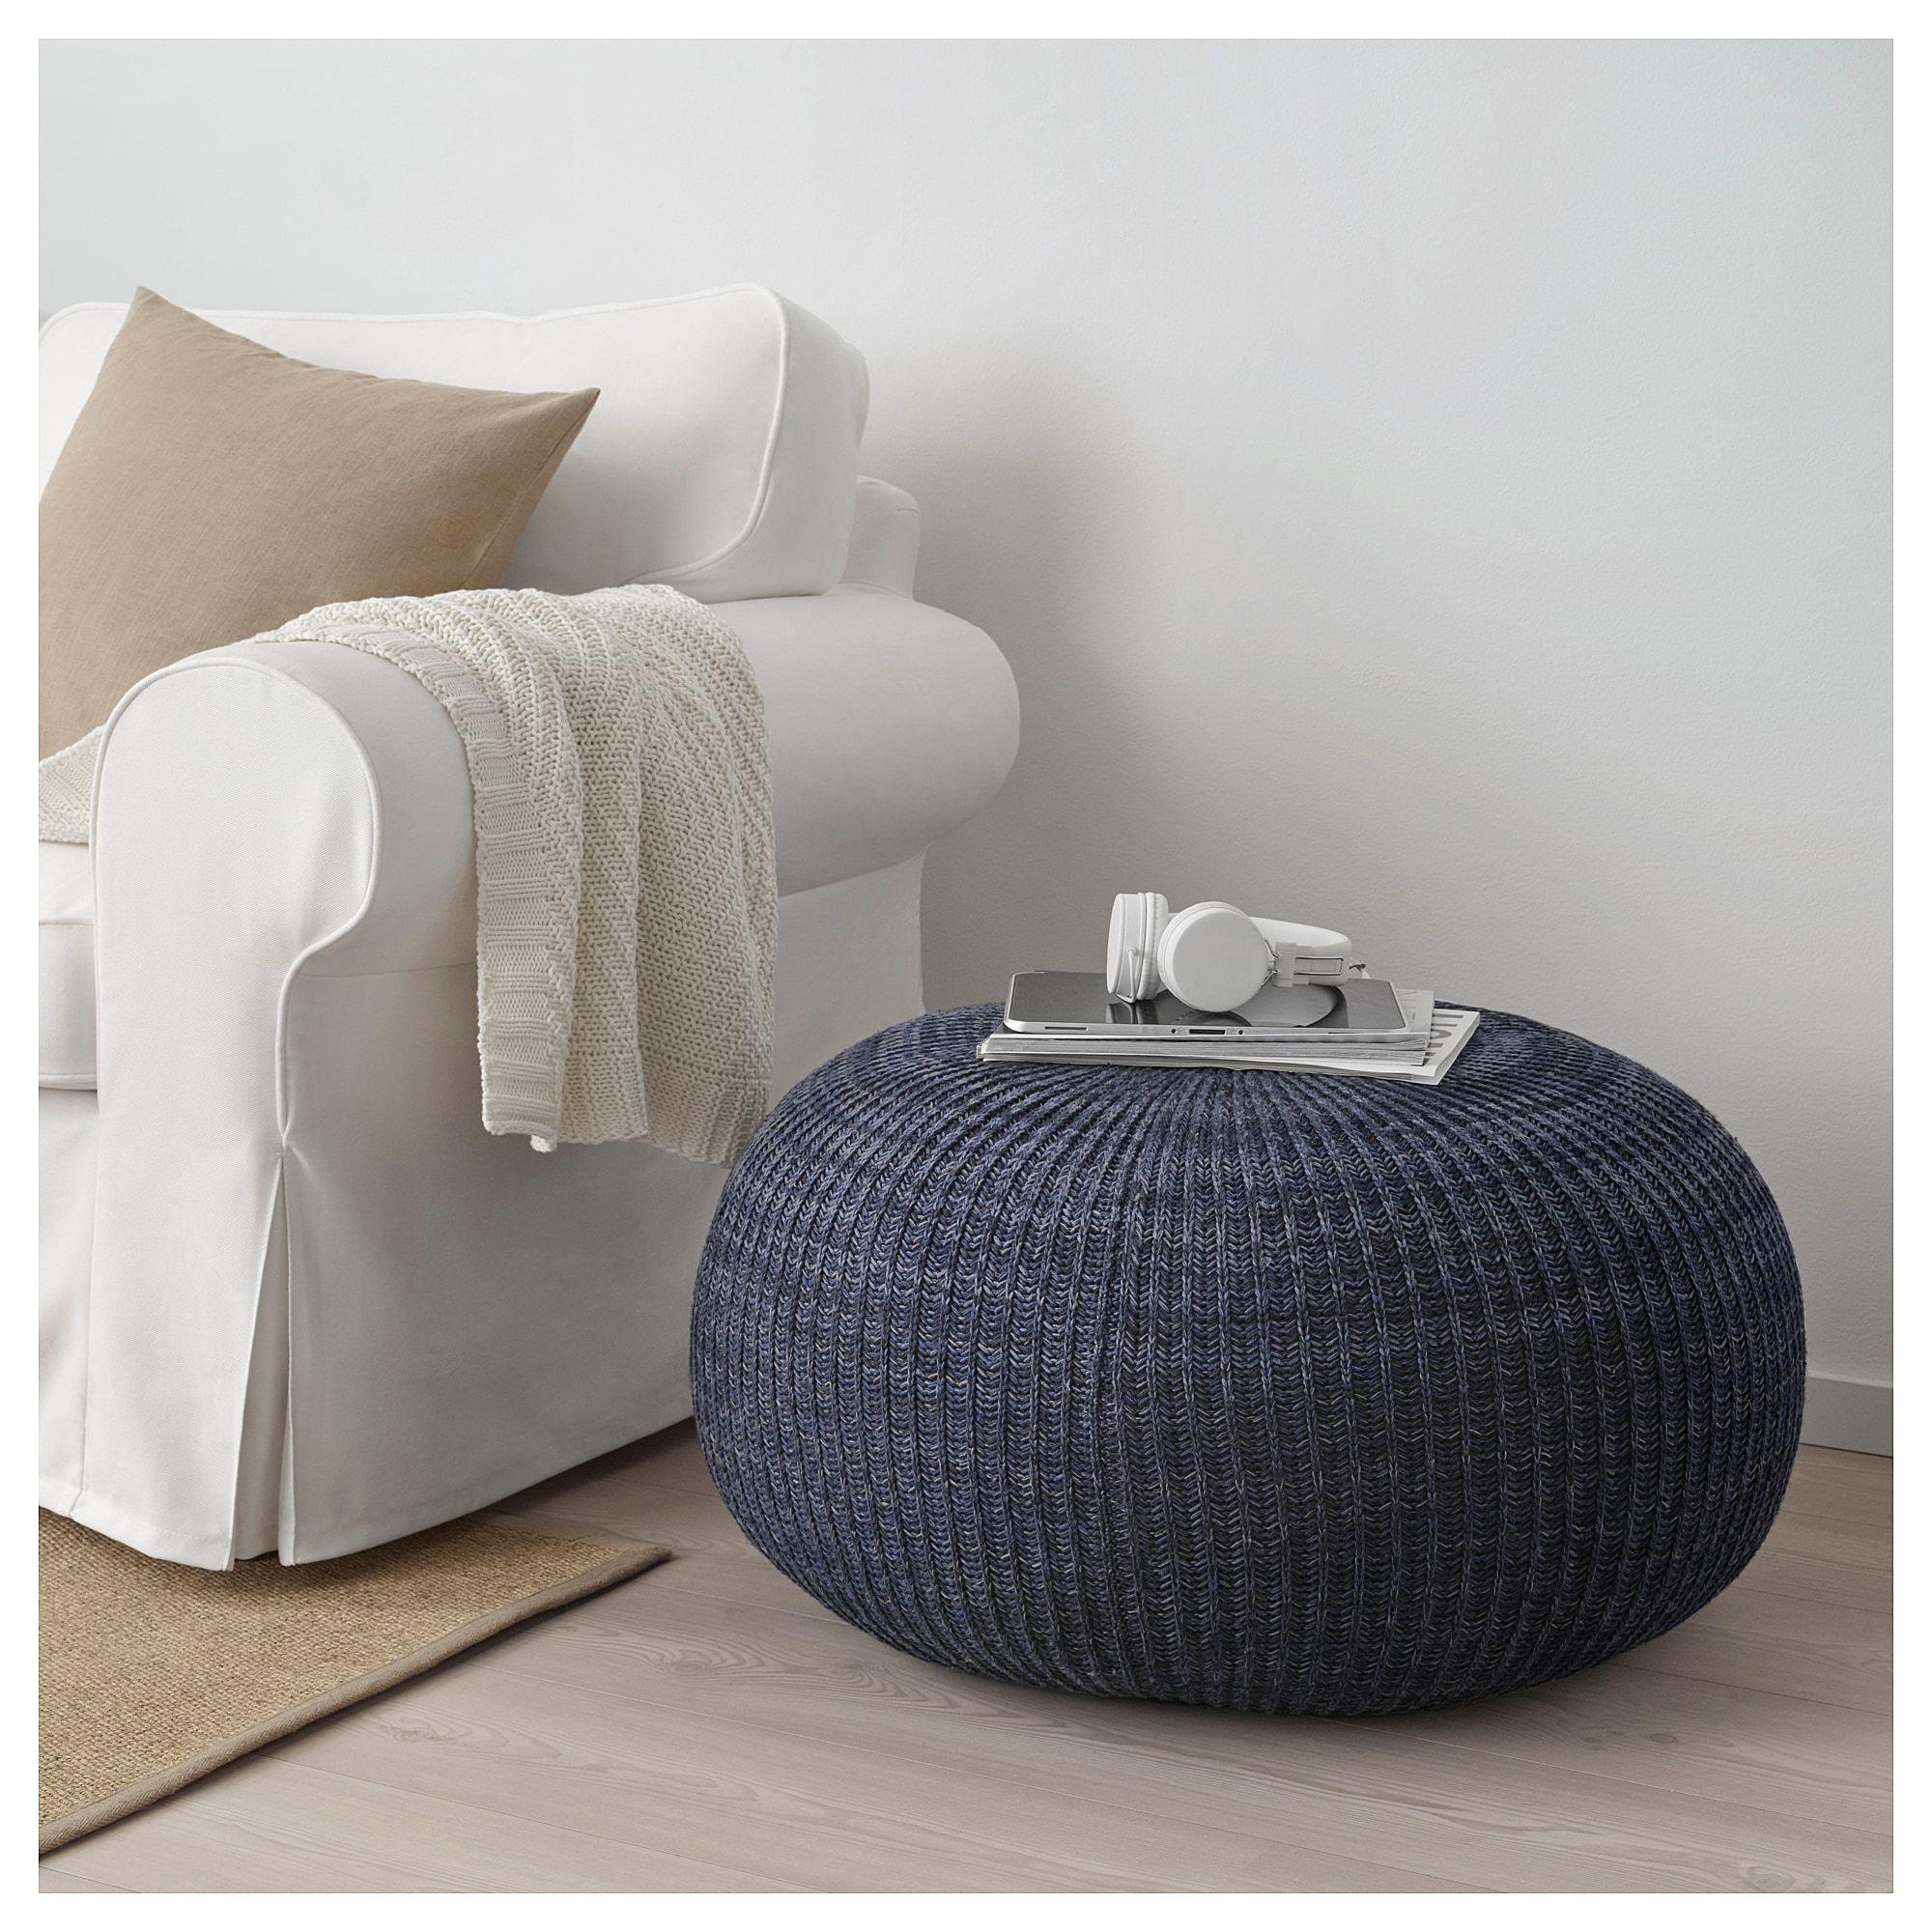 Enjoyable Sandared Pouffe Dark Blue Around The House Dining Room Machost Co Dining Chair Design Ideas Machostcouk